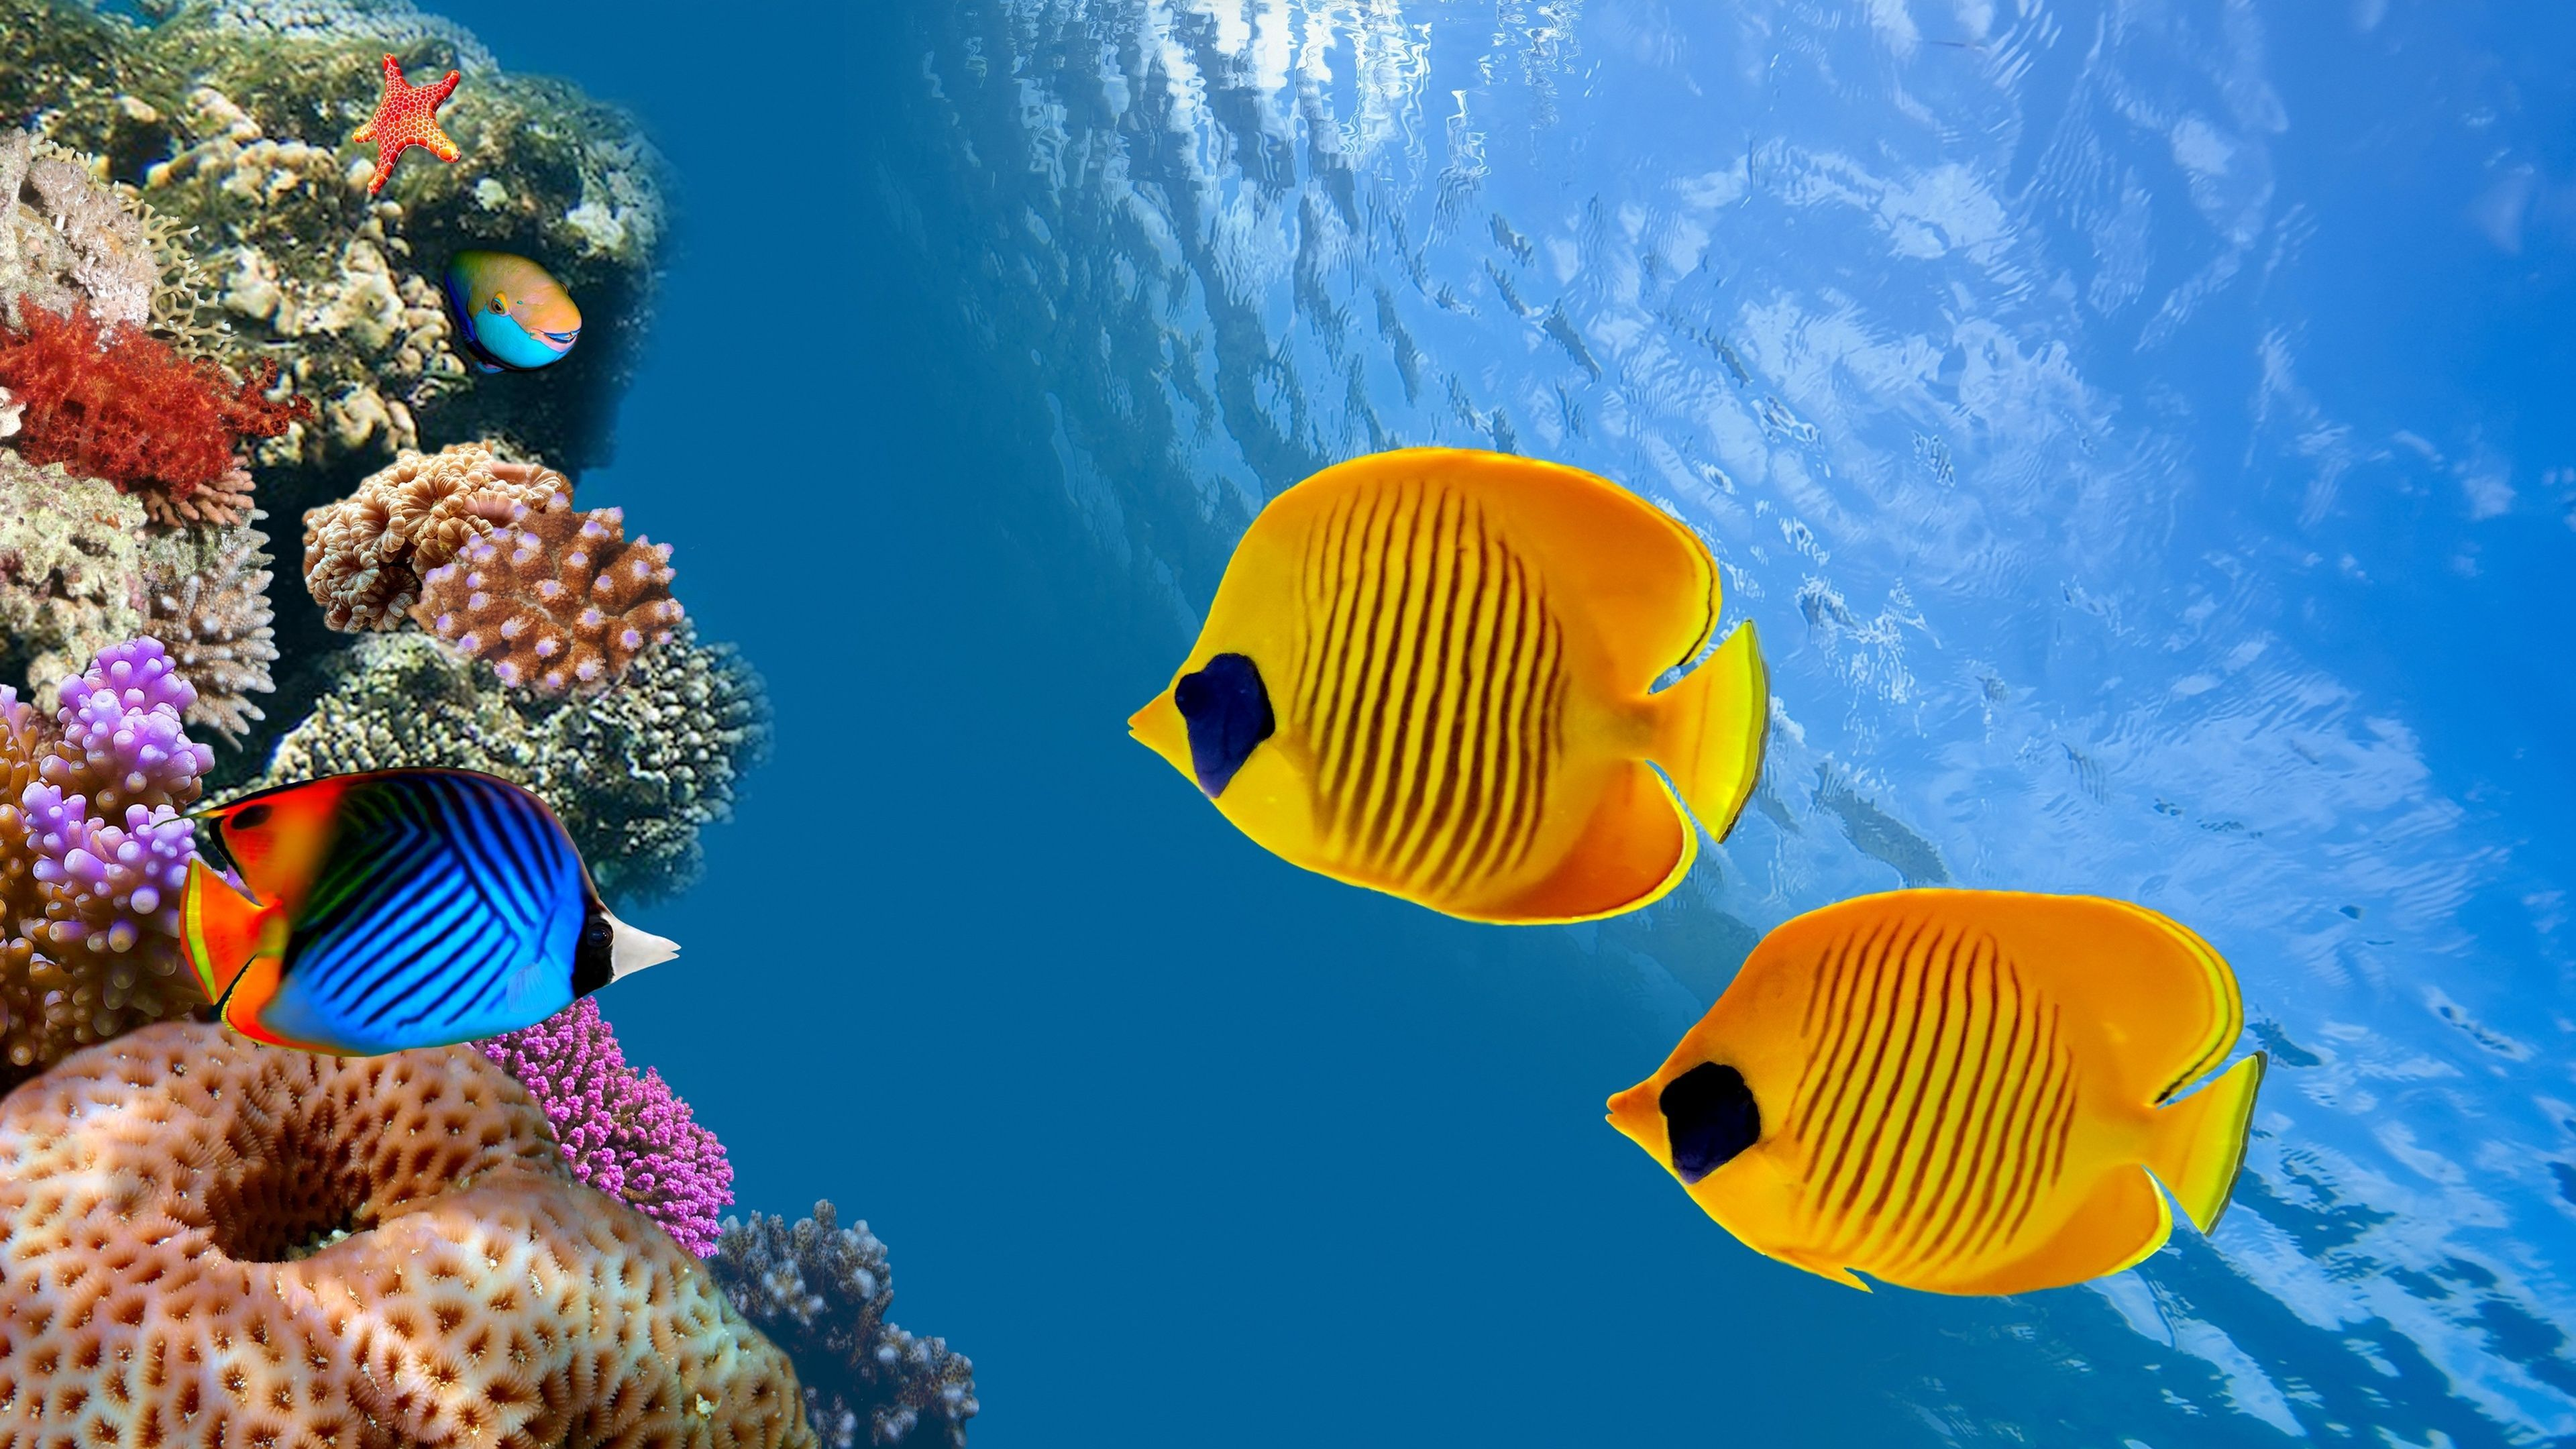 Underwater Sea Fish Underwater 4k Ultra Hd Wallpaper Fish Wallpaper Underwater Wallpaper Underwater Fish